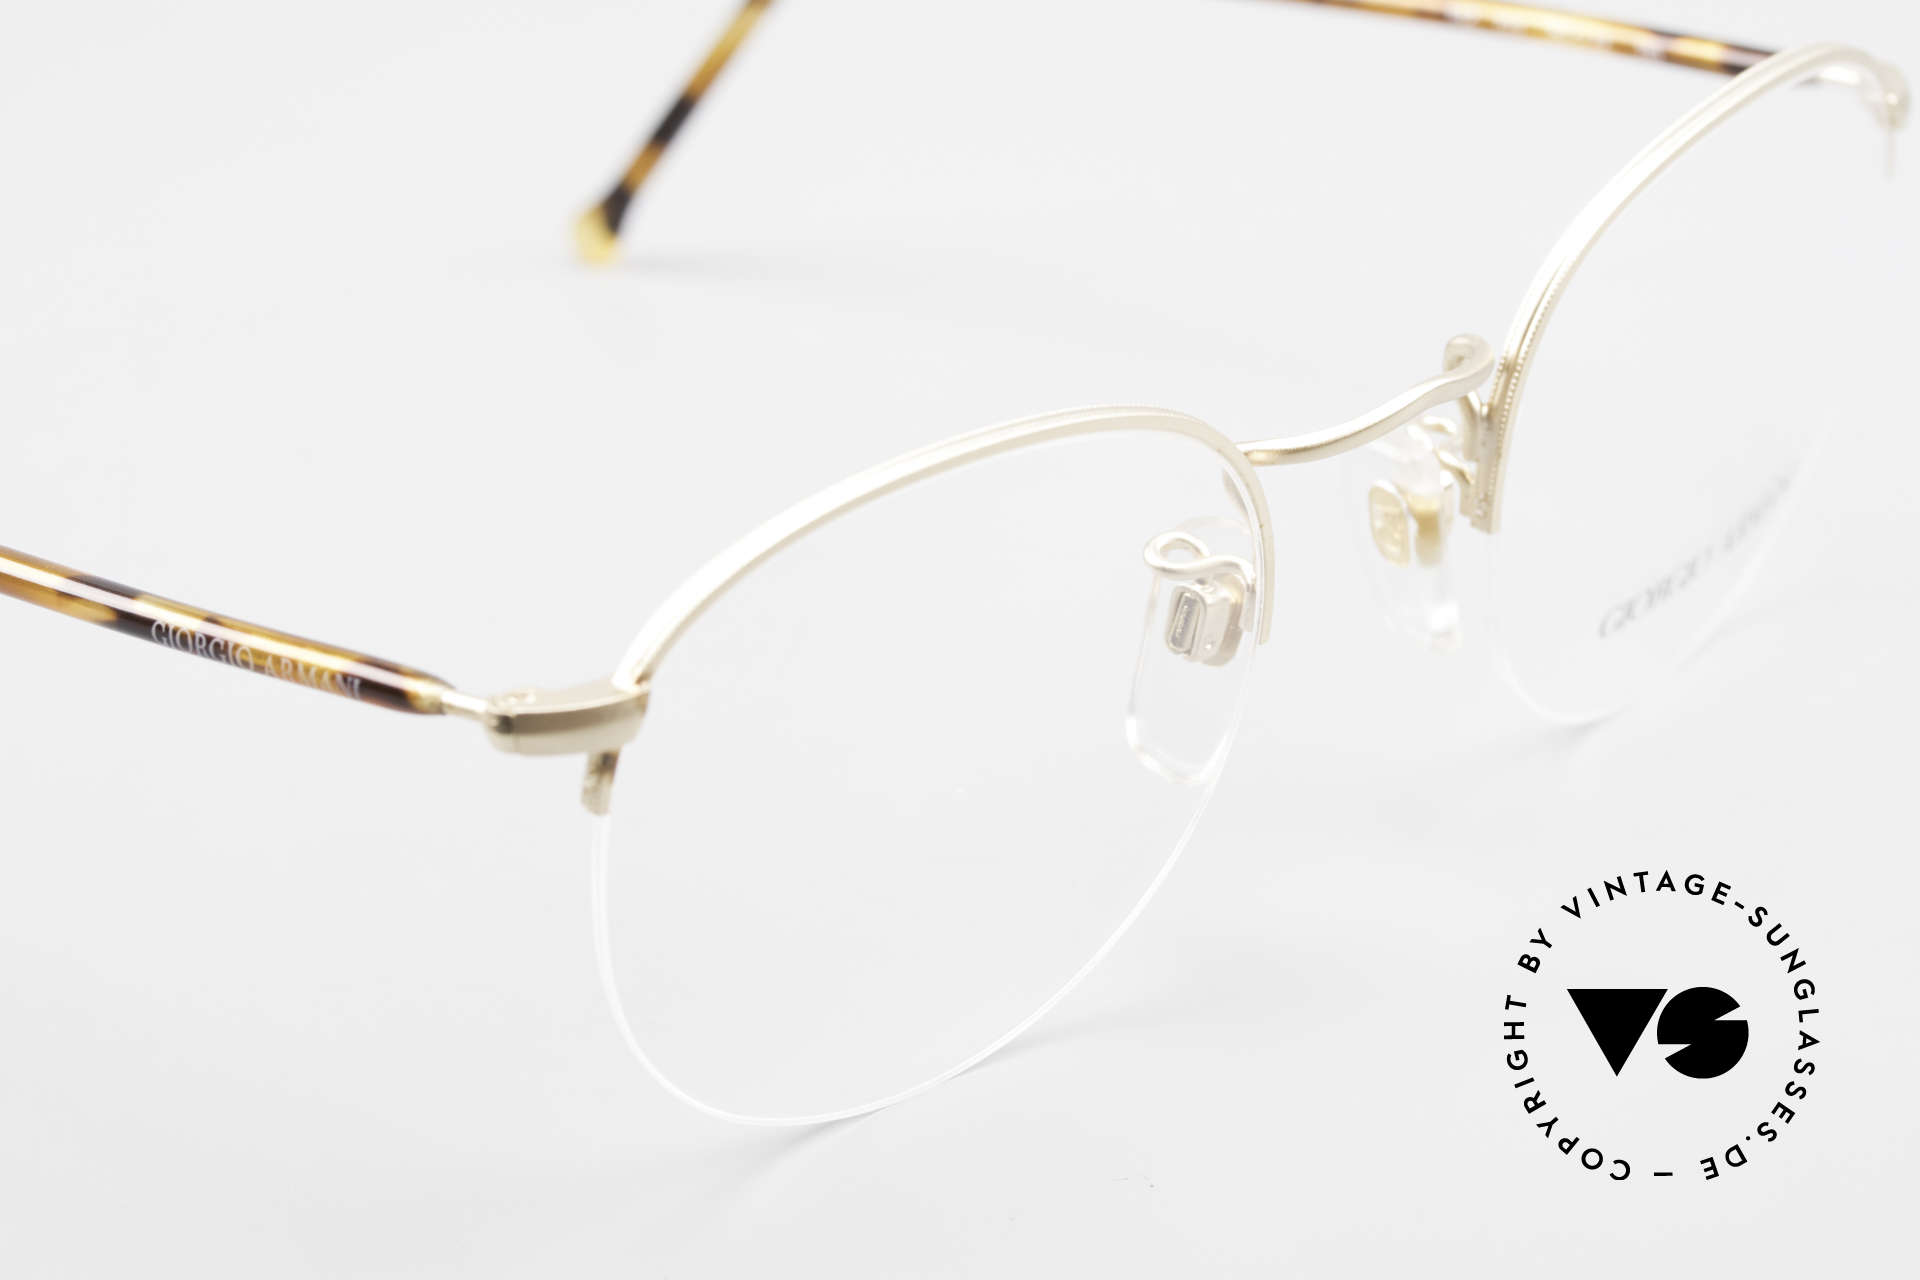 Giorgio Armani 142 Rimless Panto Eyeglasses 80's, NO RETRO EYEGLASSES, but a 30 years old Original, Made for Men and Women